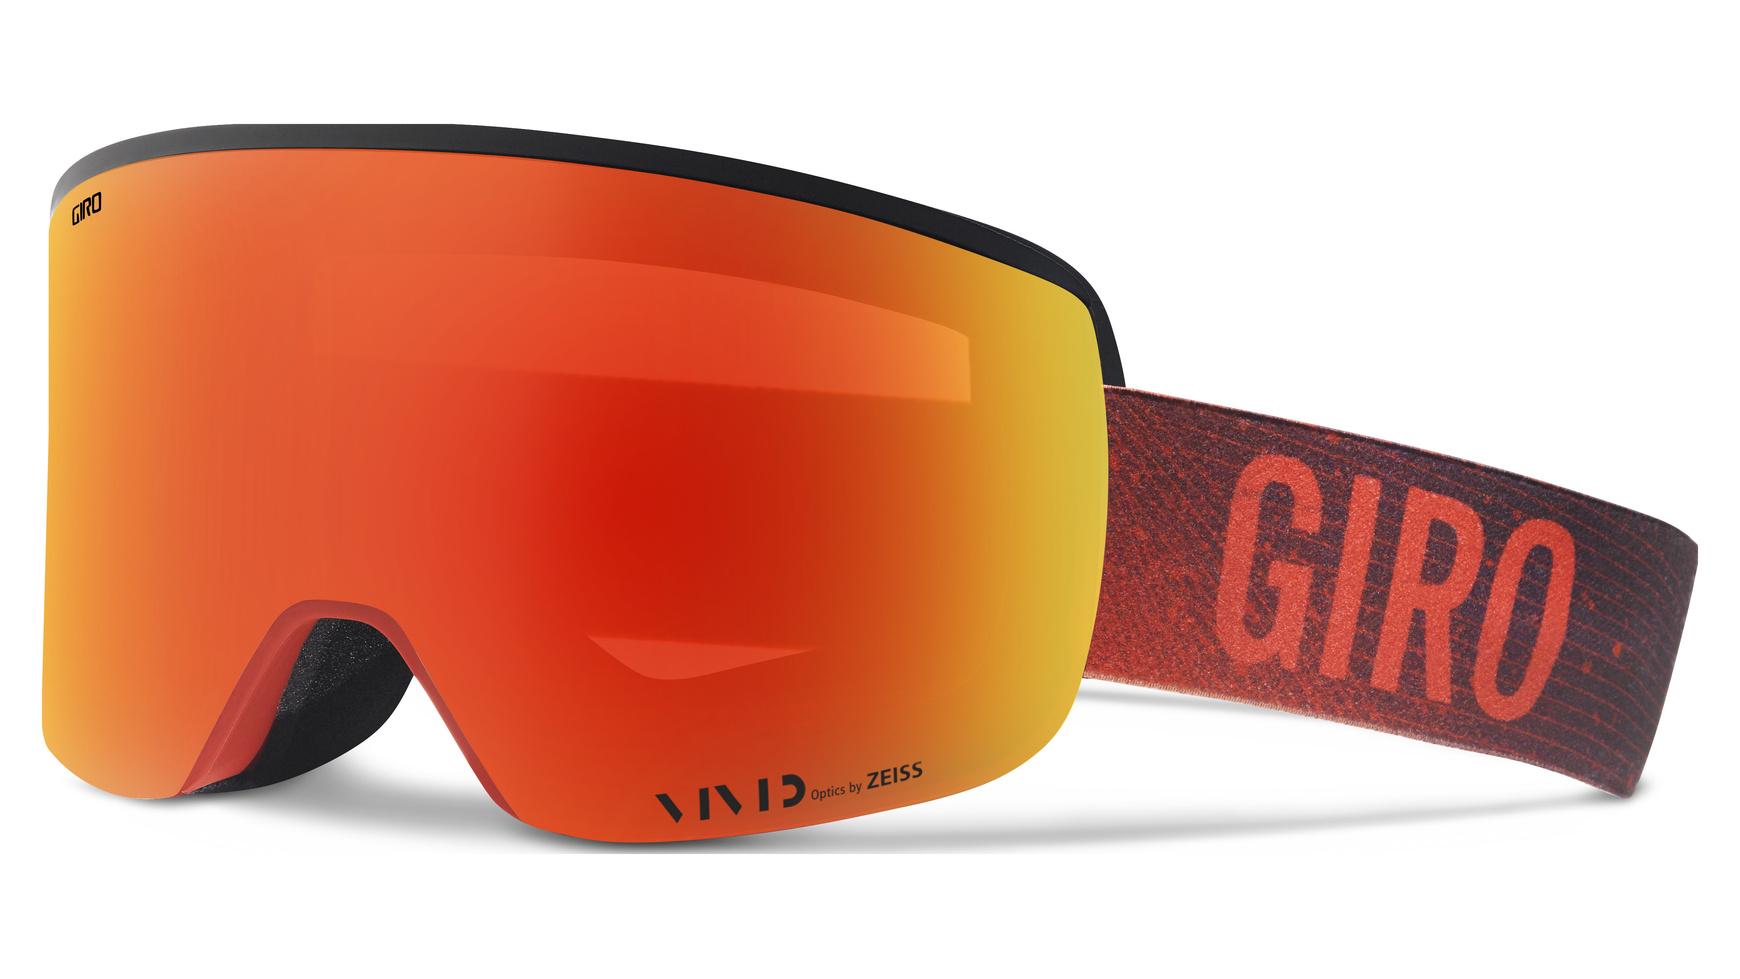 300054014-giro_g_axis_redfaded_vividember